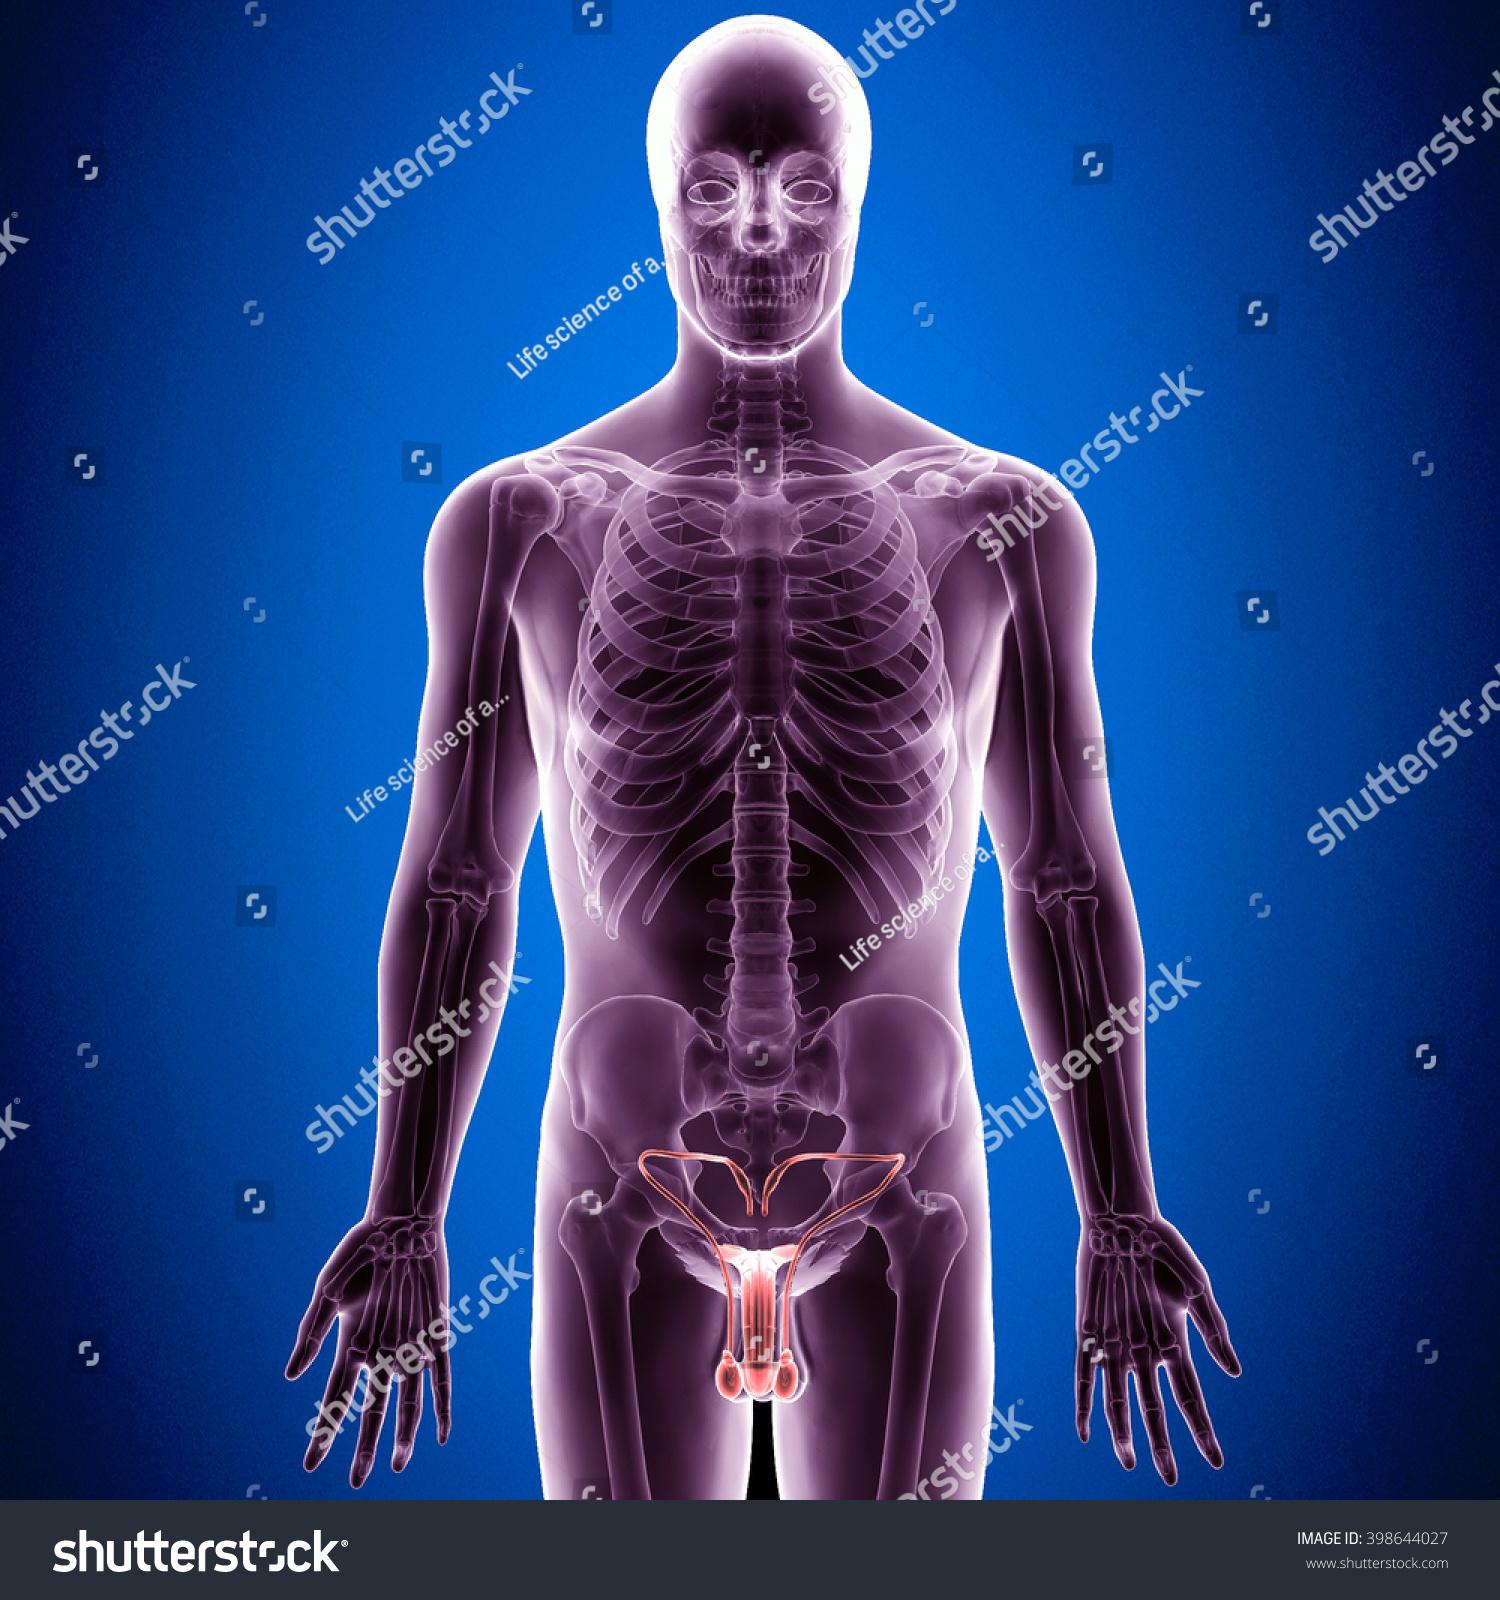 3 D Illustration Male Reproductive System Stock Illustration